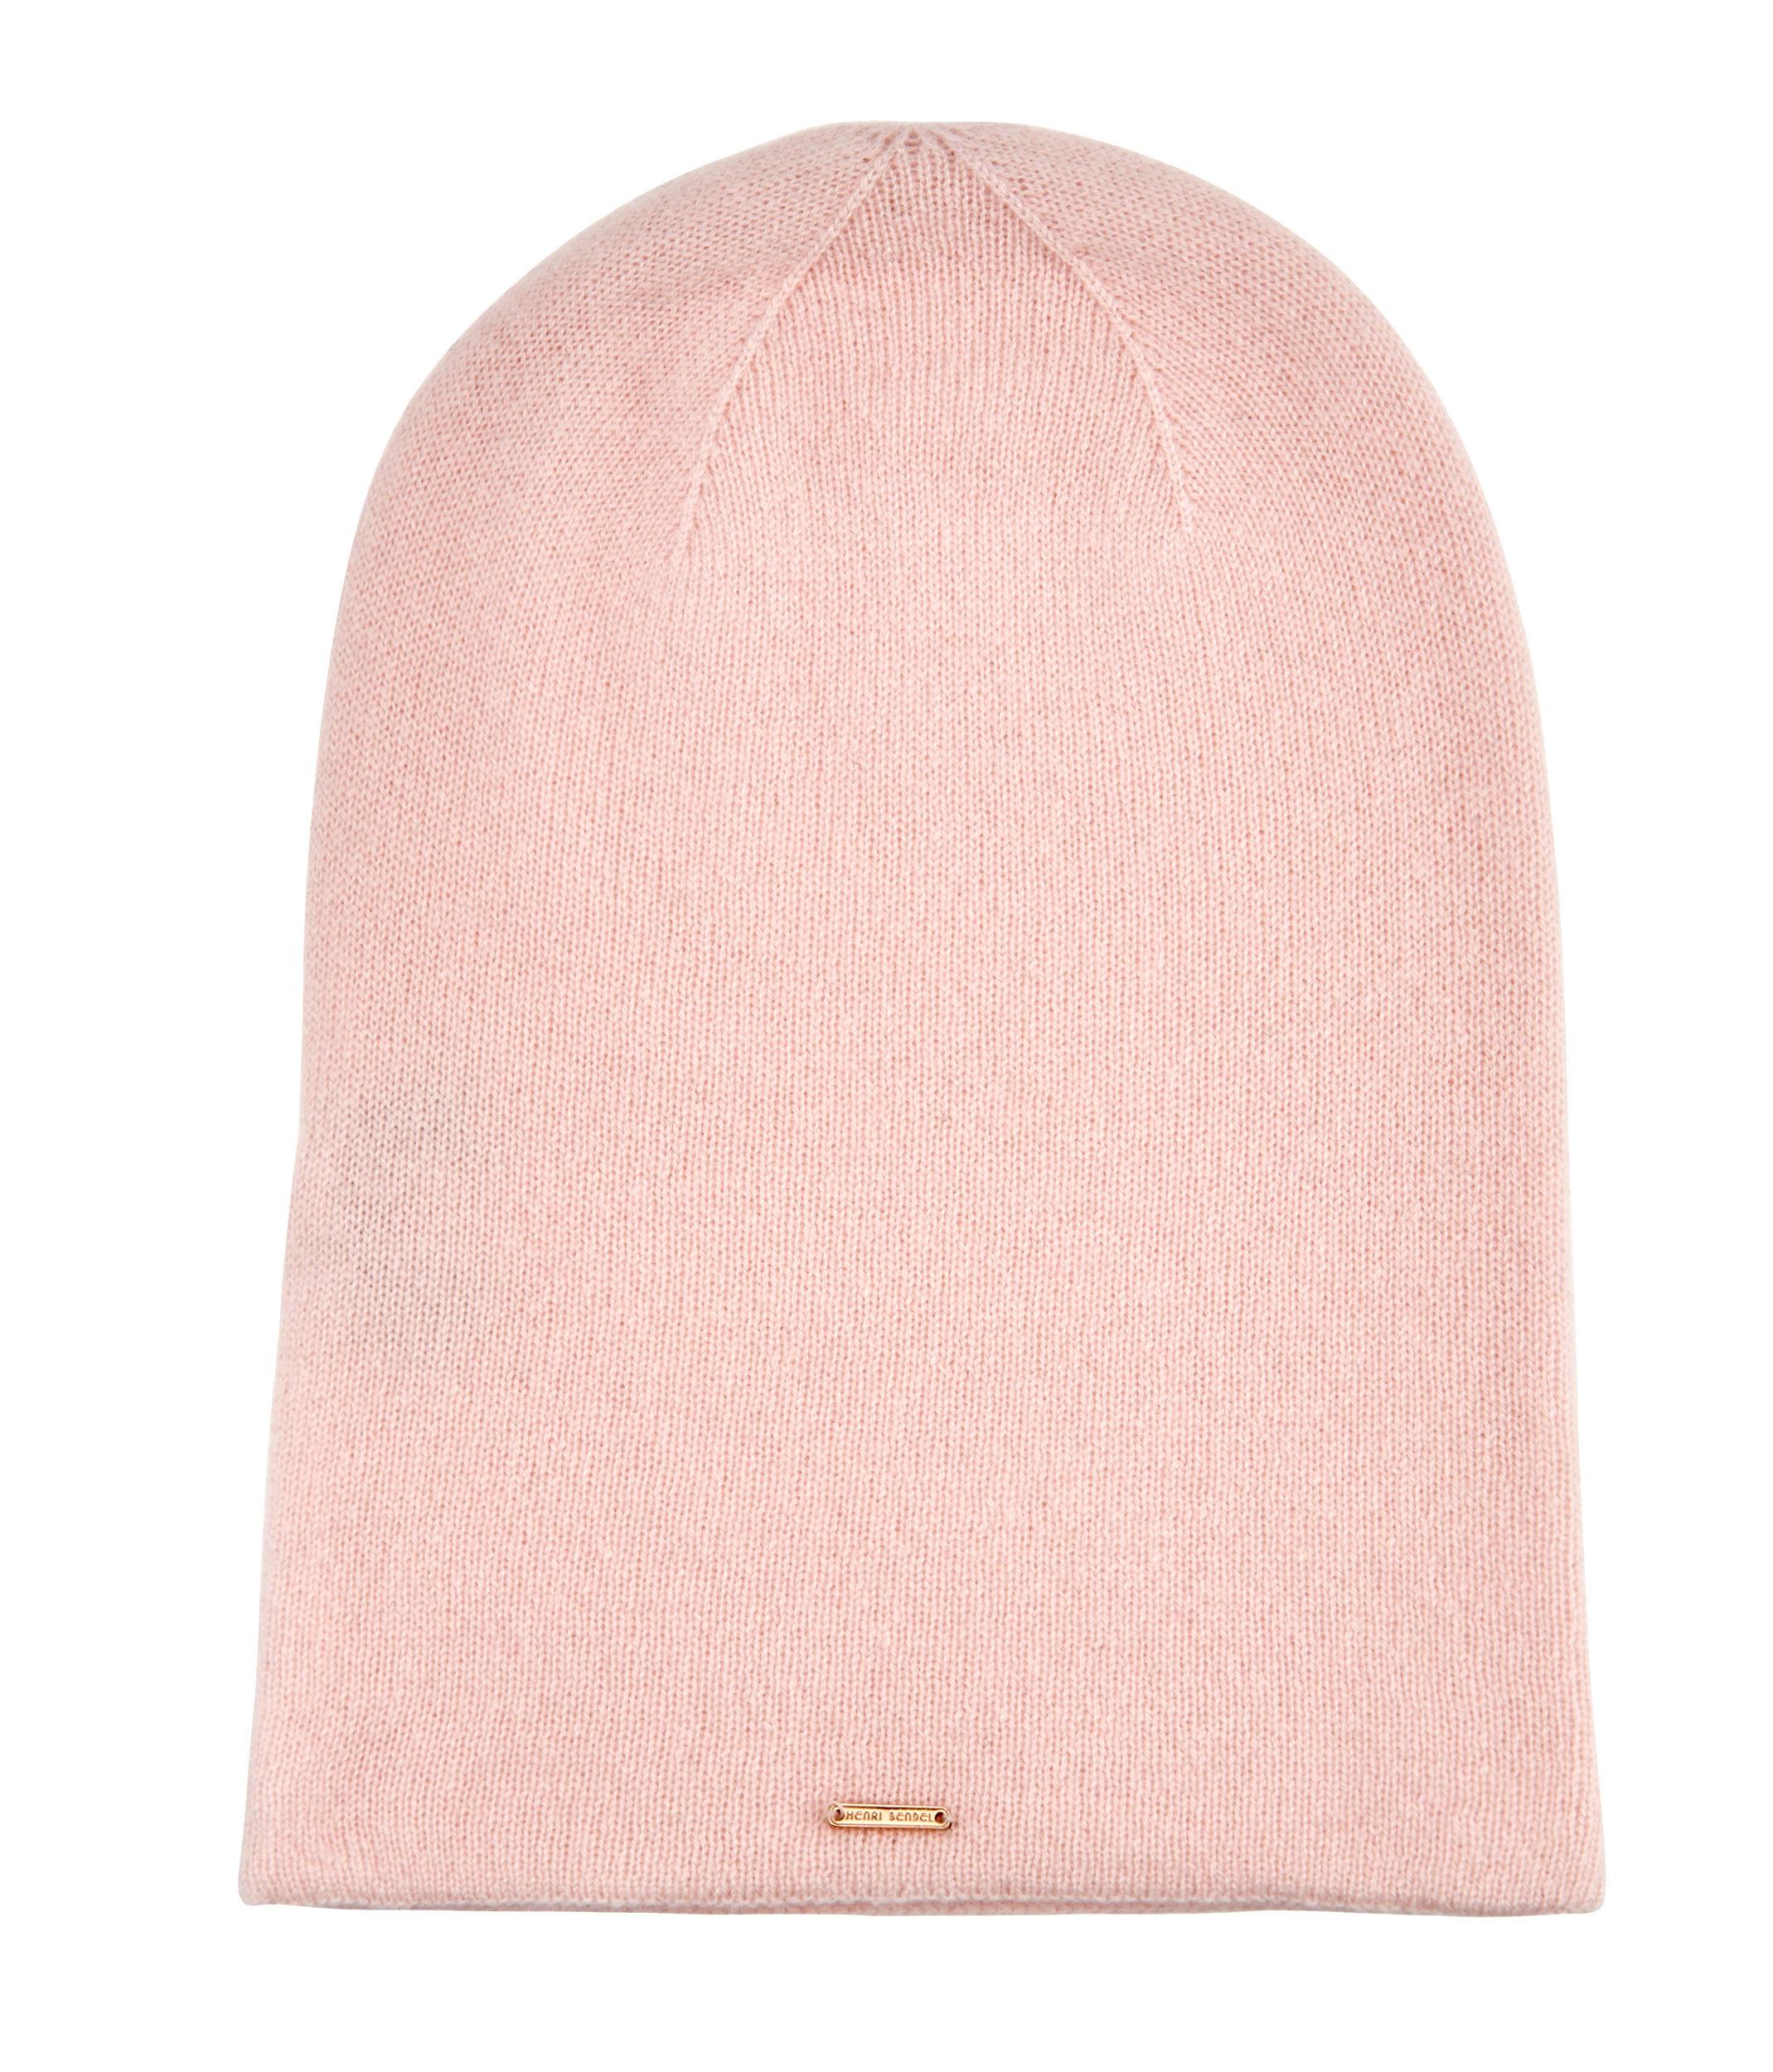 e49f59a30dc Lyst - Henri Bendel Cashmere Hat in Pink